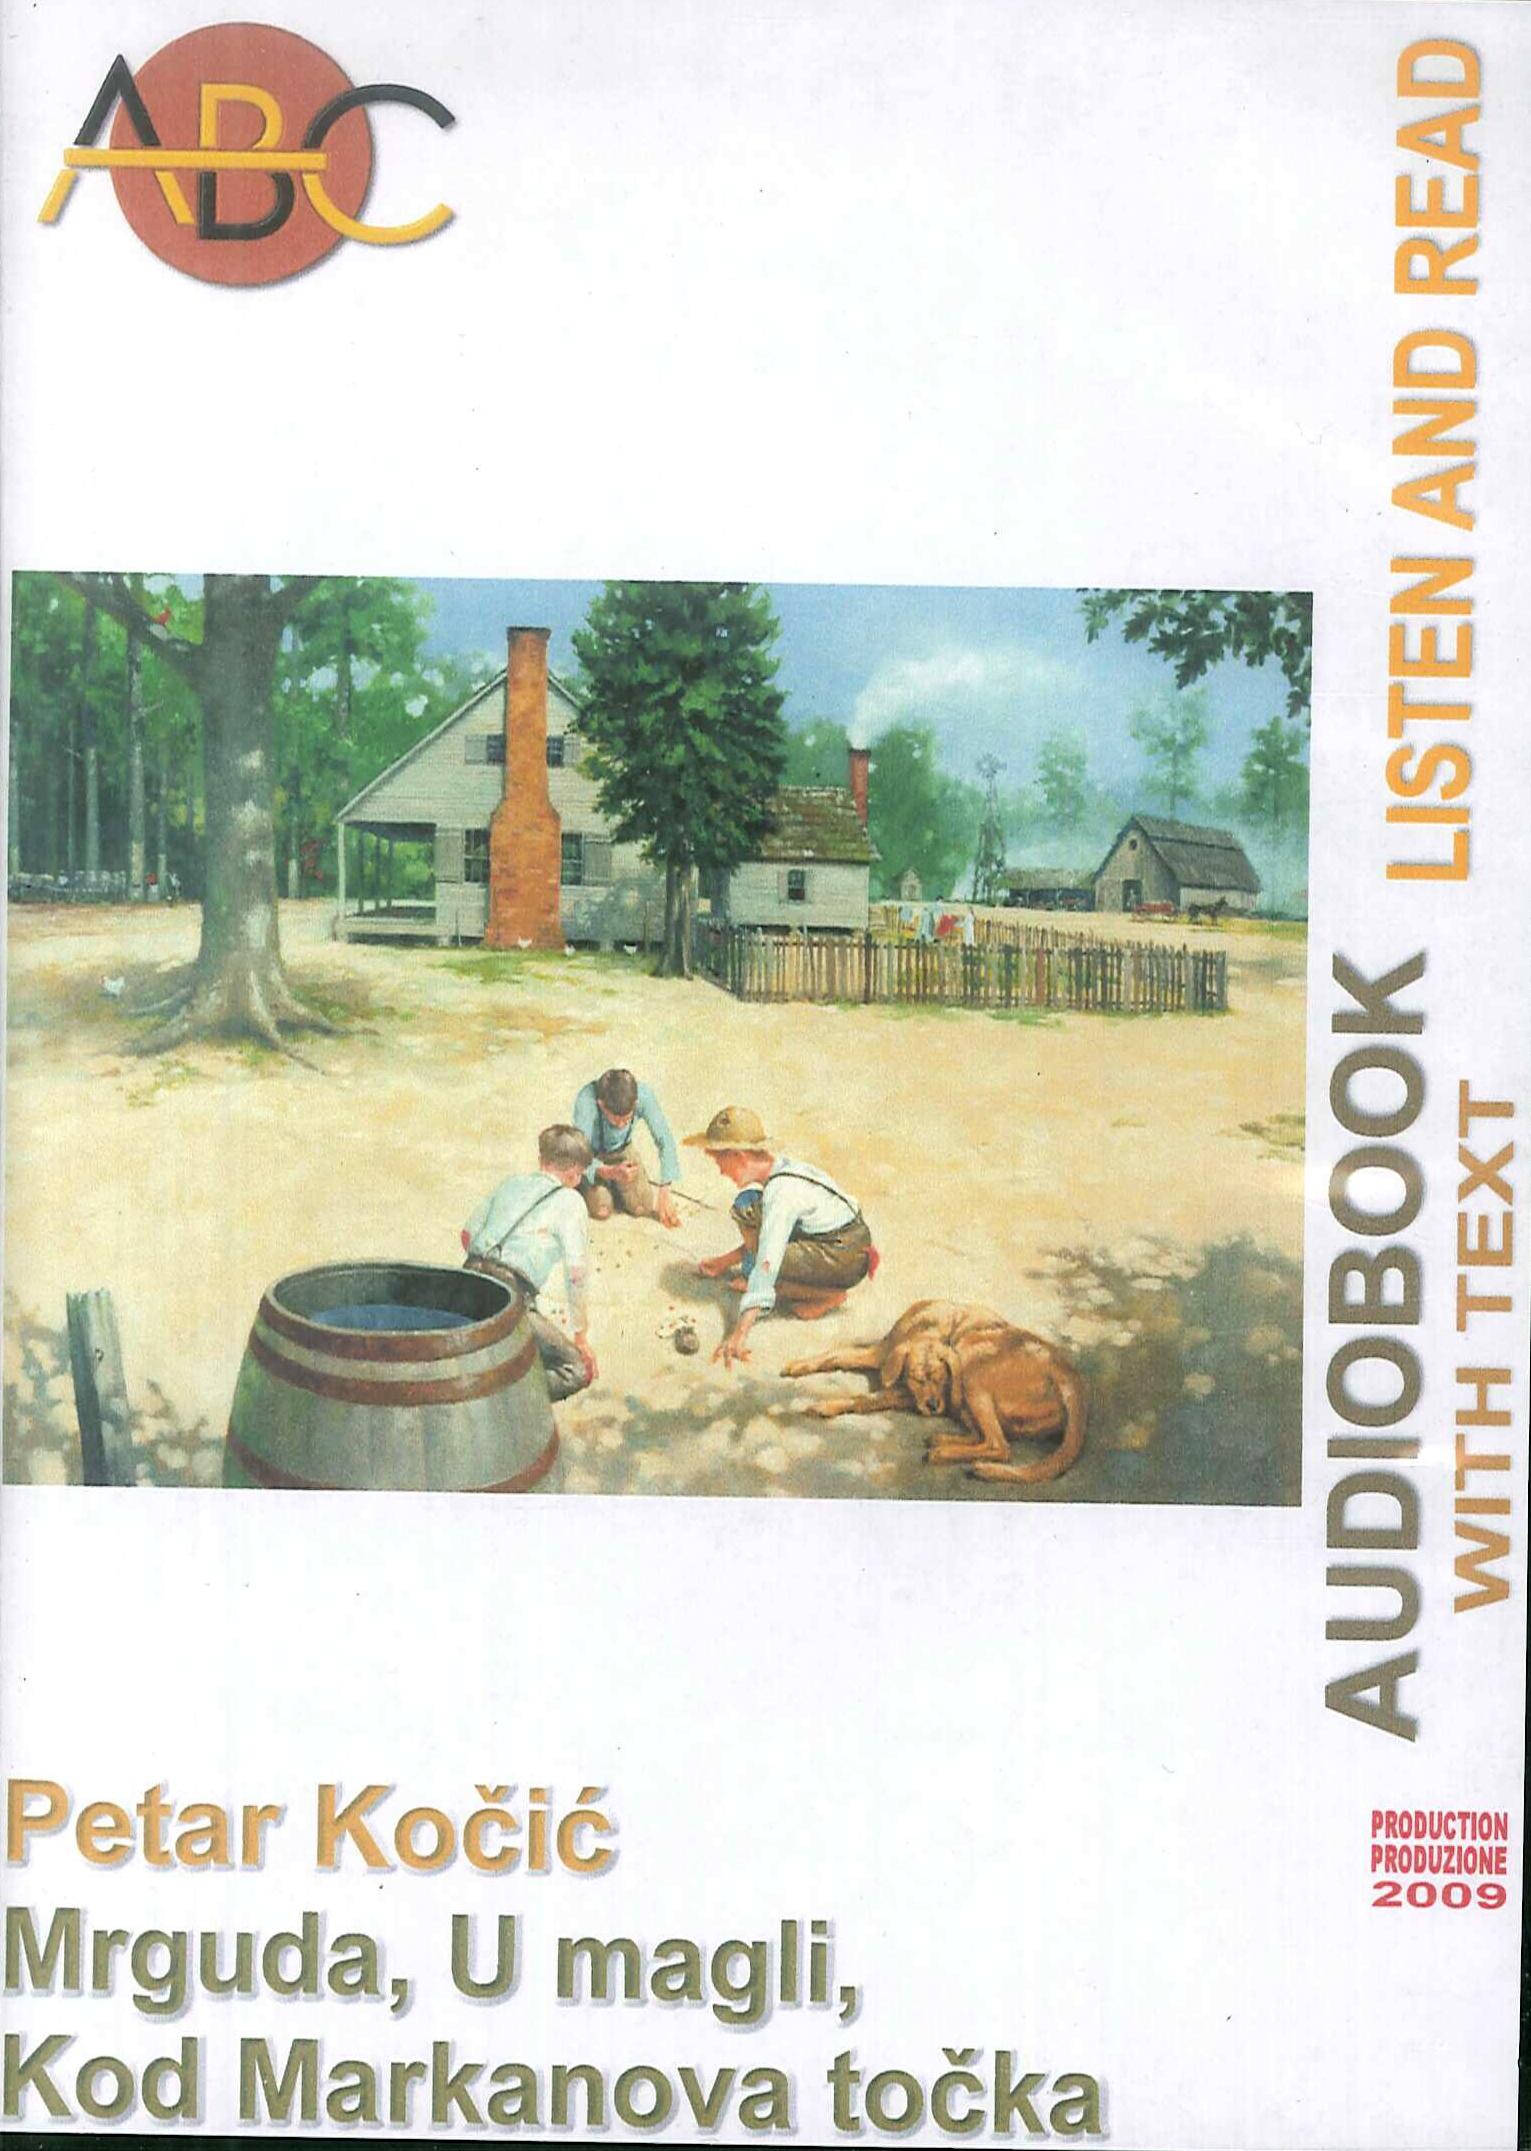 Kod markanovog tocka, mrguda, u magli. Audiolibro. CD Audio e CD-ROM. Cat.n. 02/037